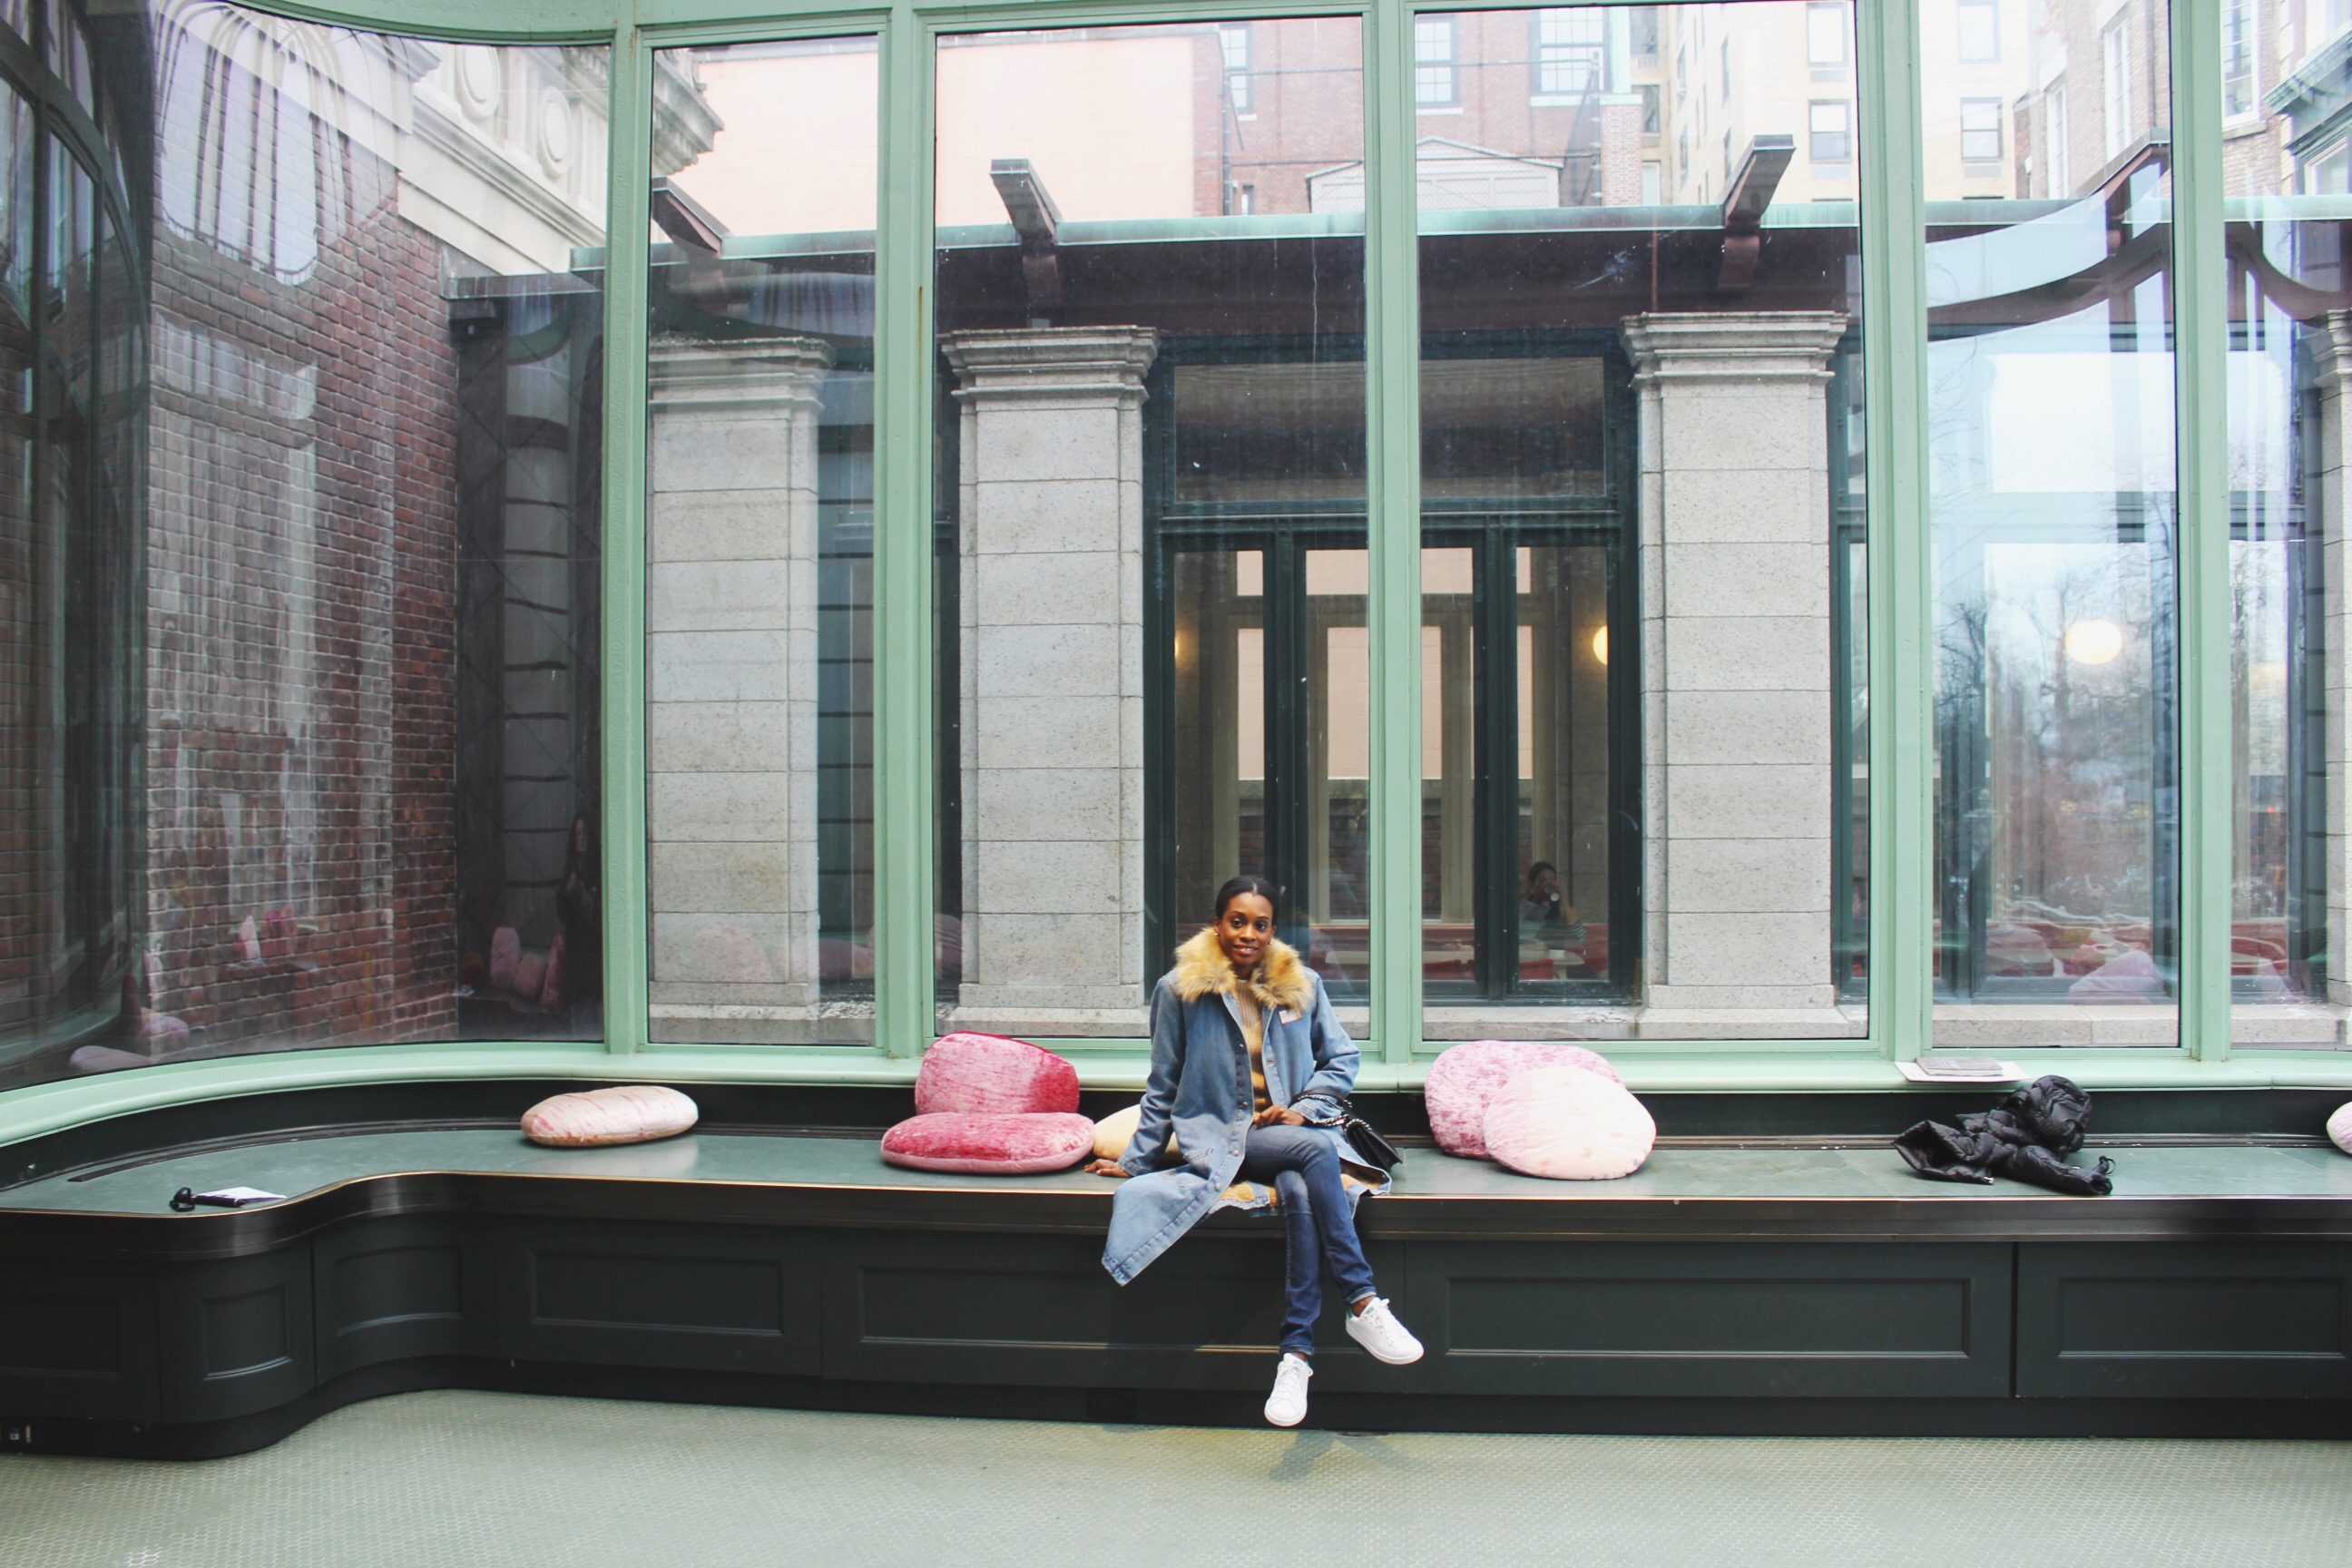 alyssa francois at cooper hewitt design museum